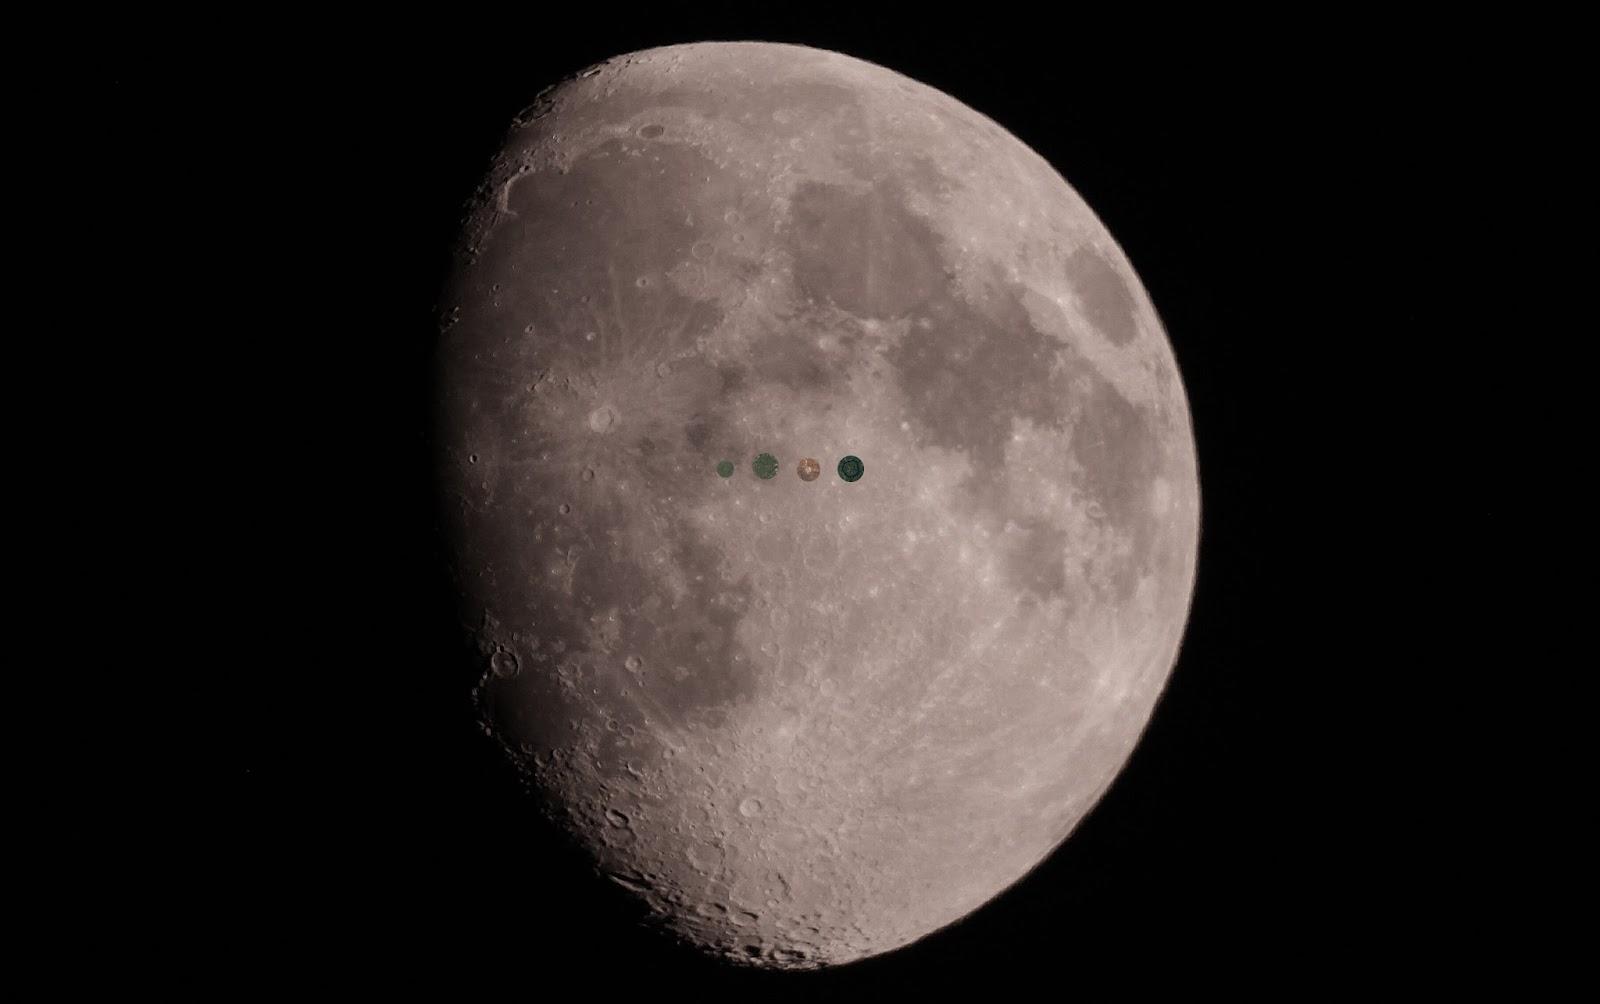 Luna crateres - El cielo de Rasal